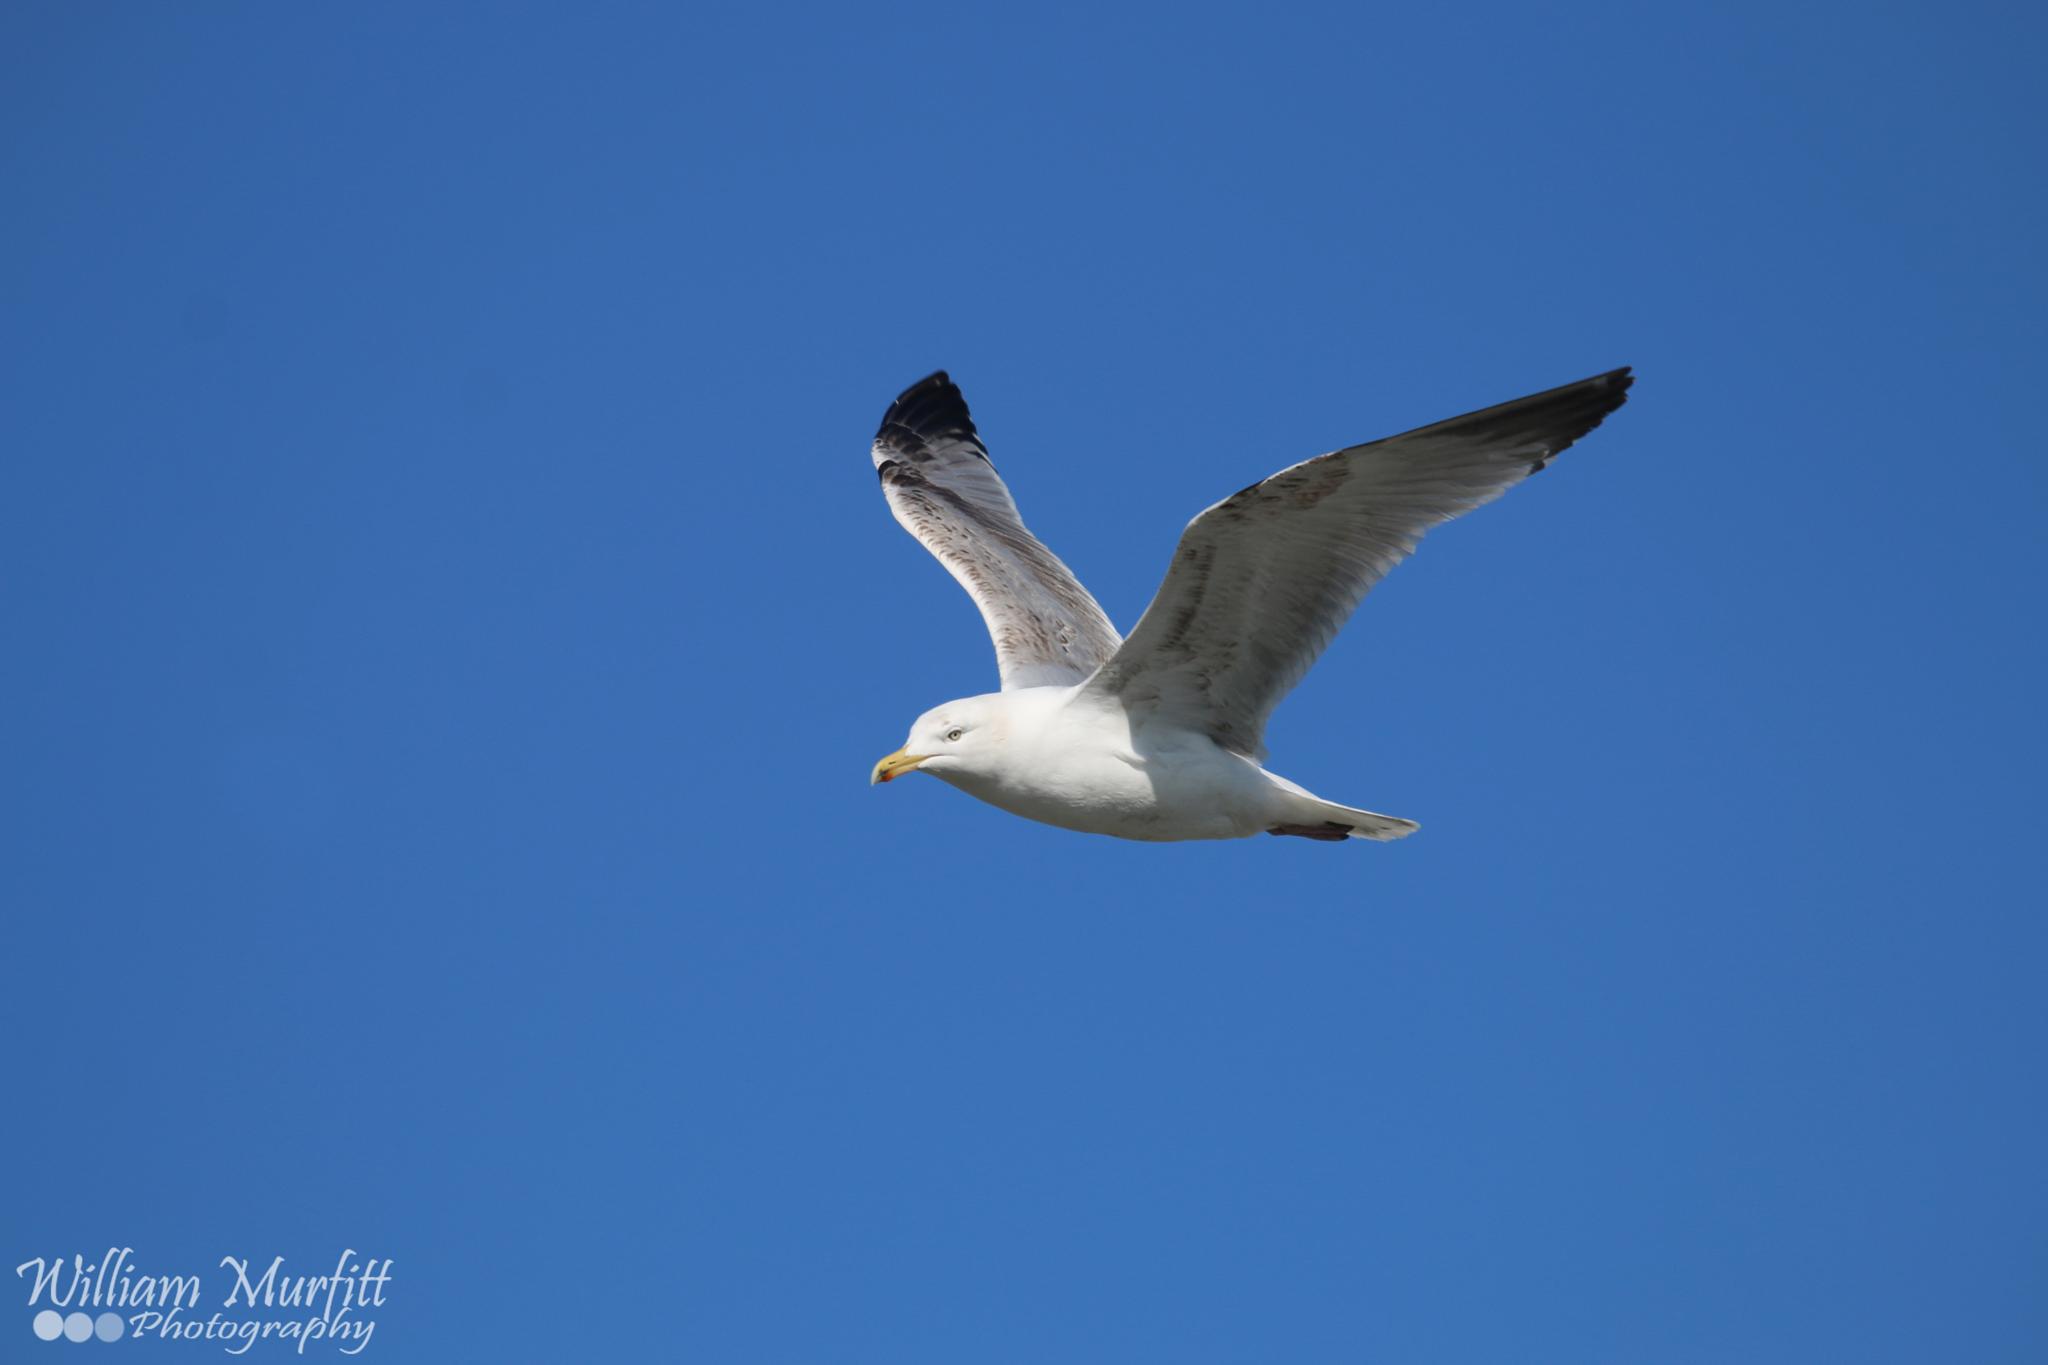 flap those wings by william.murfitt